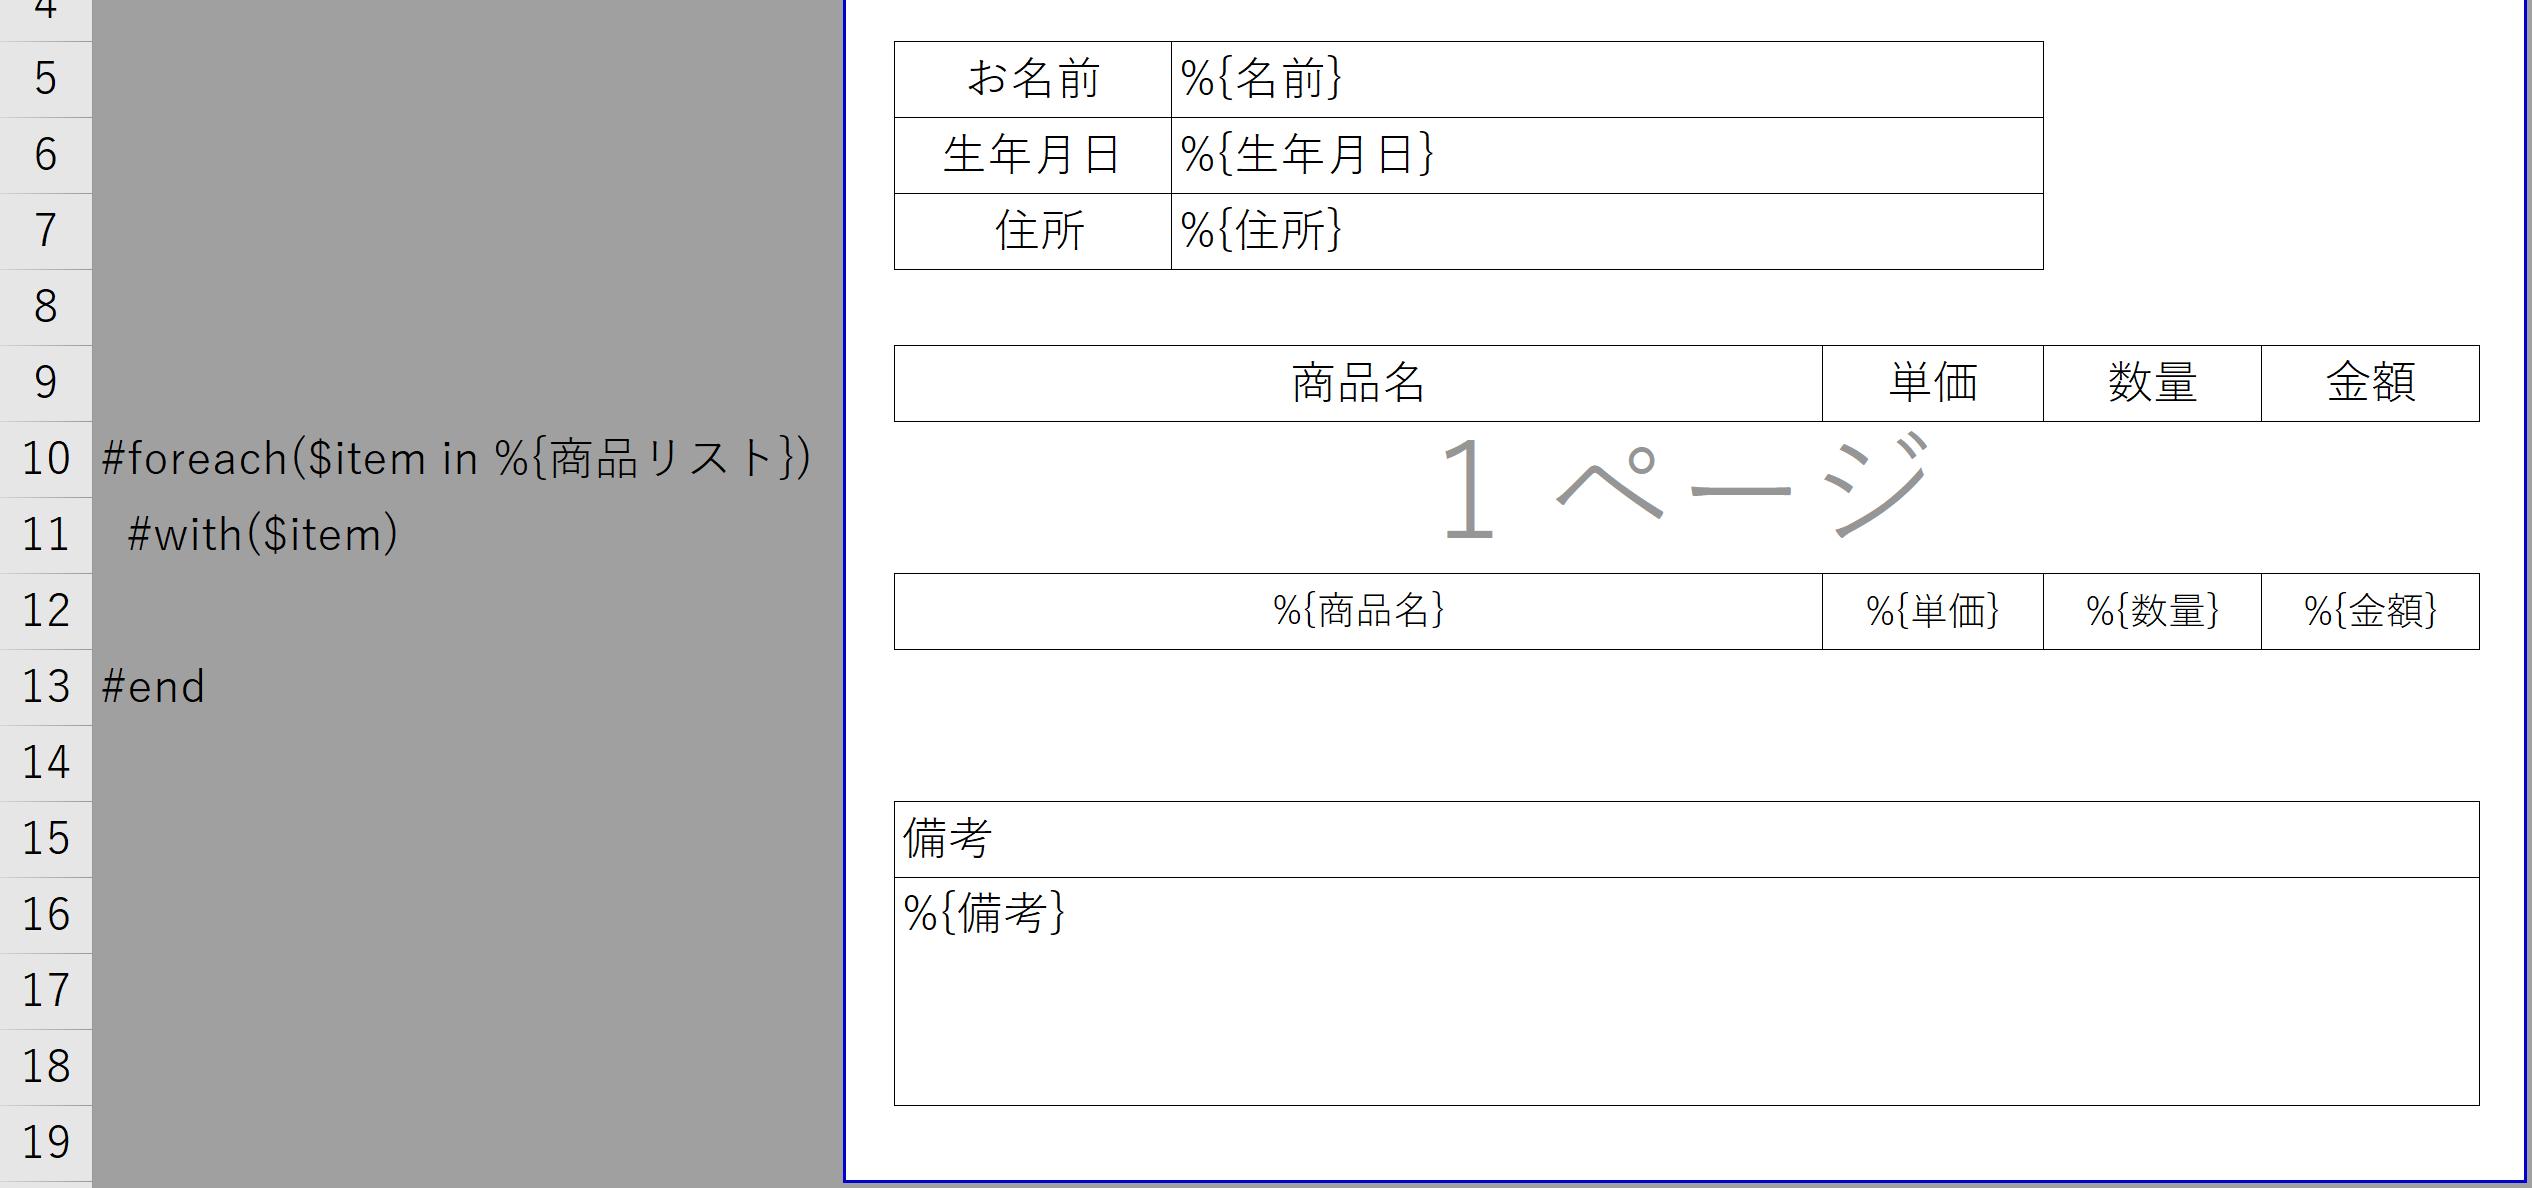 https://s3.ap-northeast-1.amazonaws.com/site.docurain.jp/blog/2020/08/with_blog_4.png